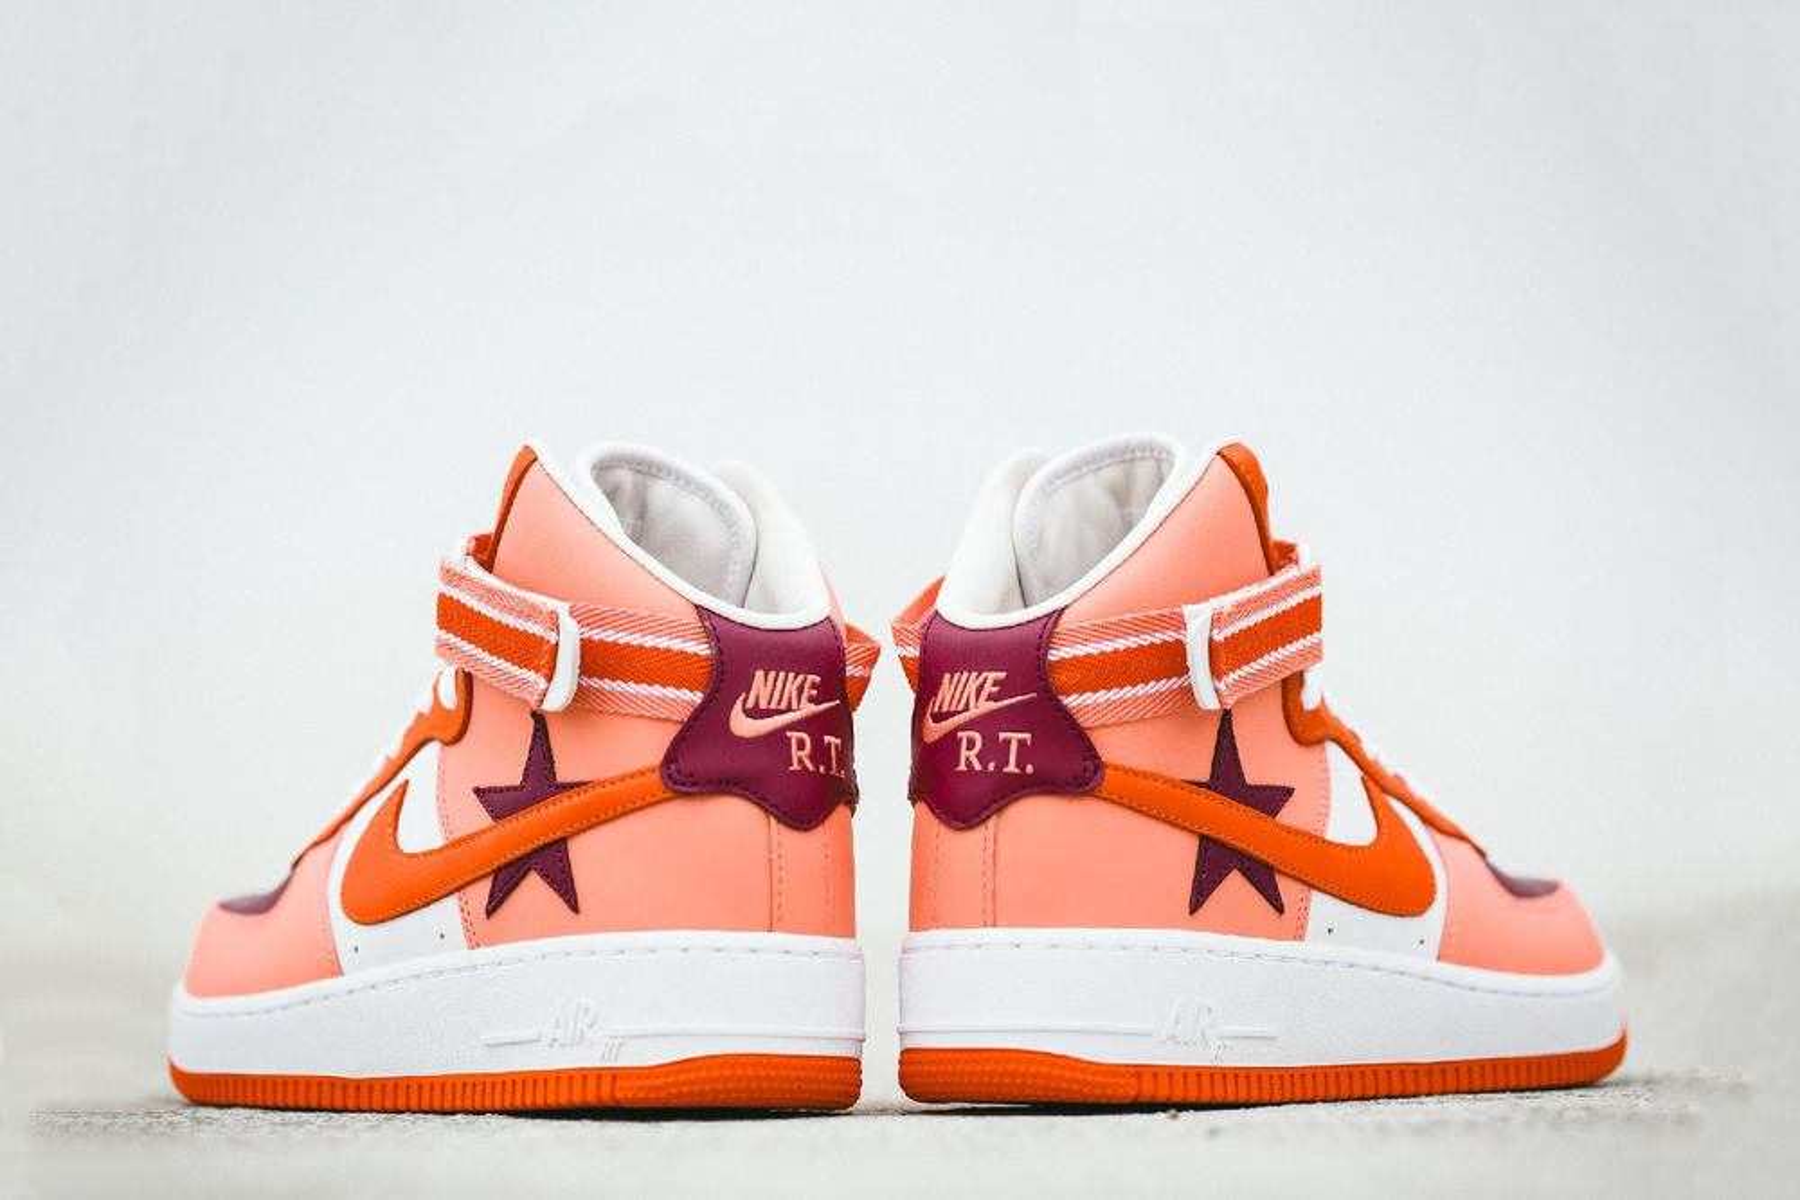 A Closer Look at the Riccardo Tisci x Nike Air Force 1 High Pt.2